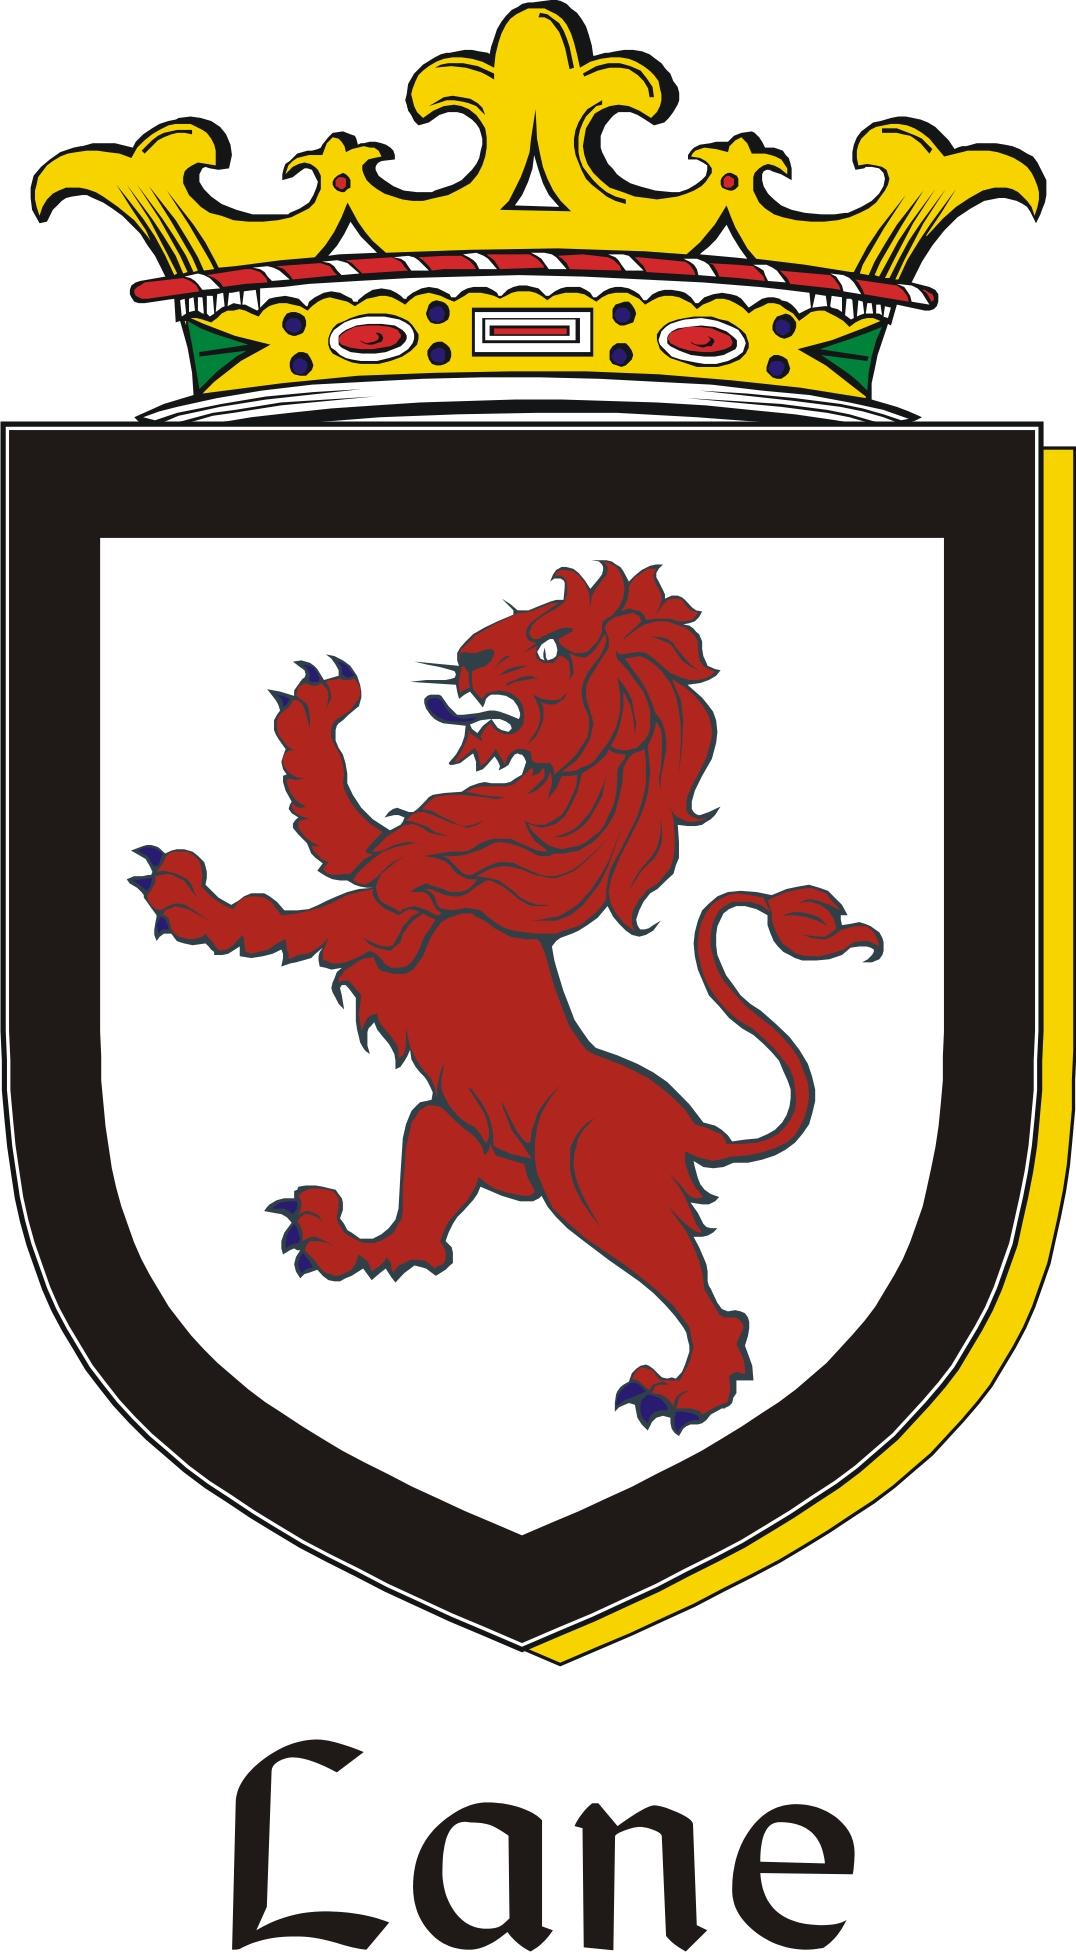 lane family crest    irish coat of arms image download